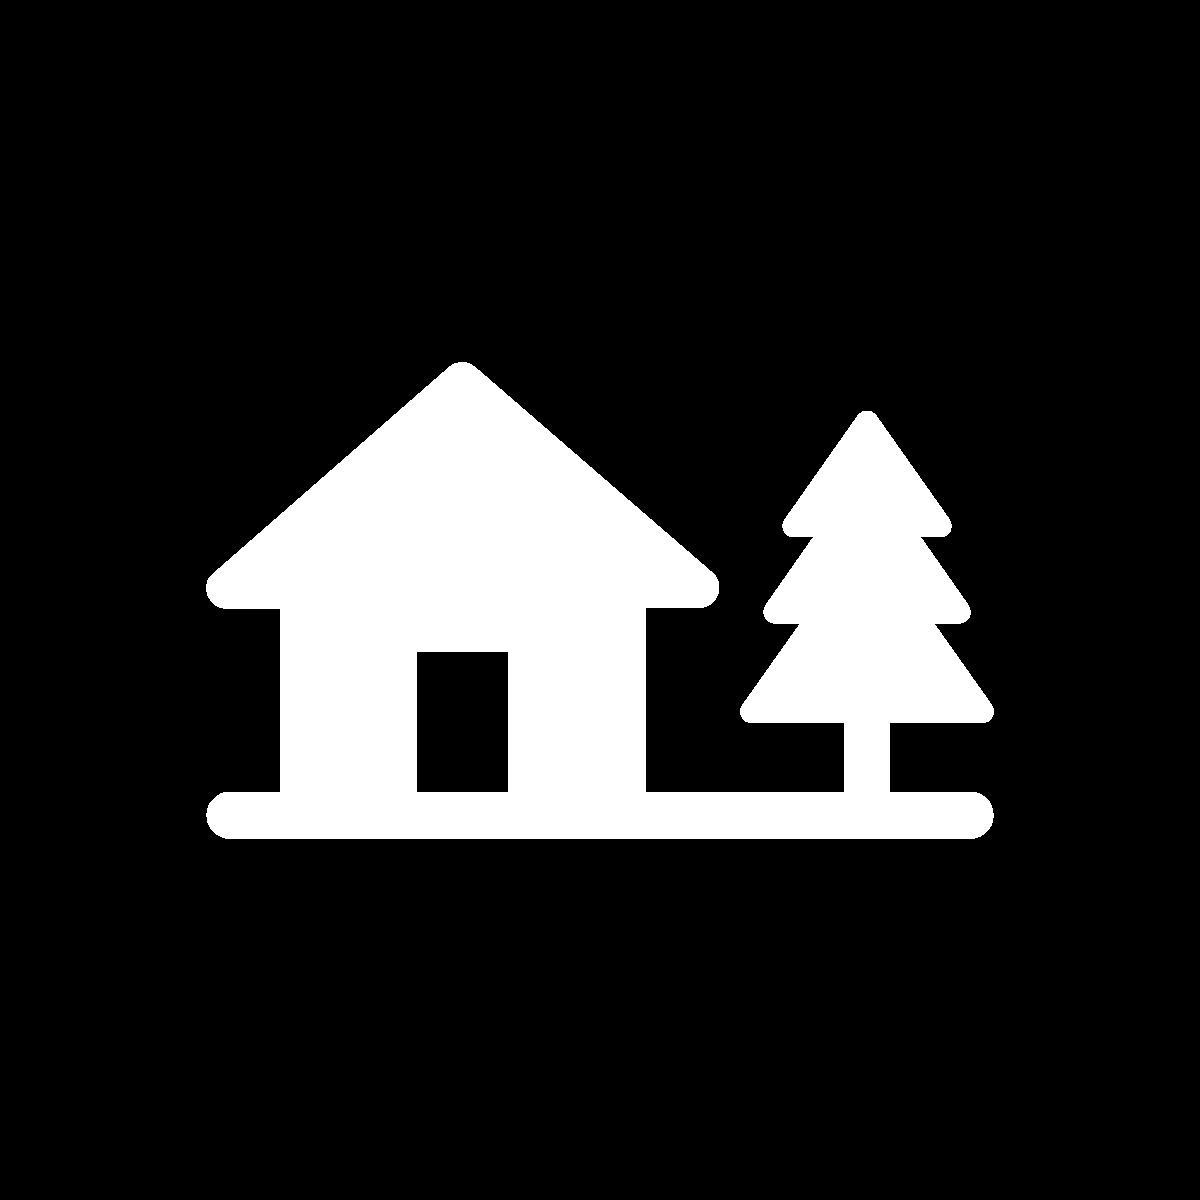 Camp Seymour Cabin Mate Request